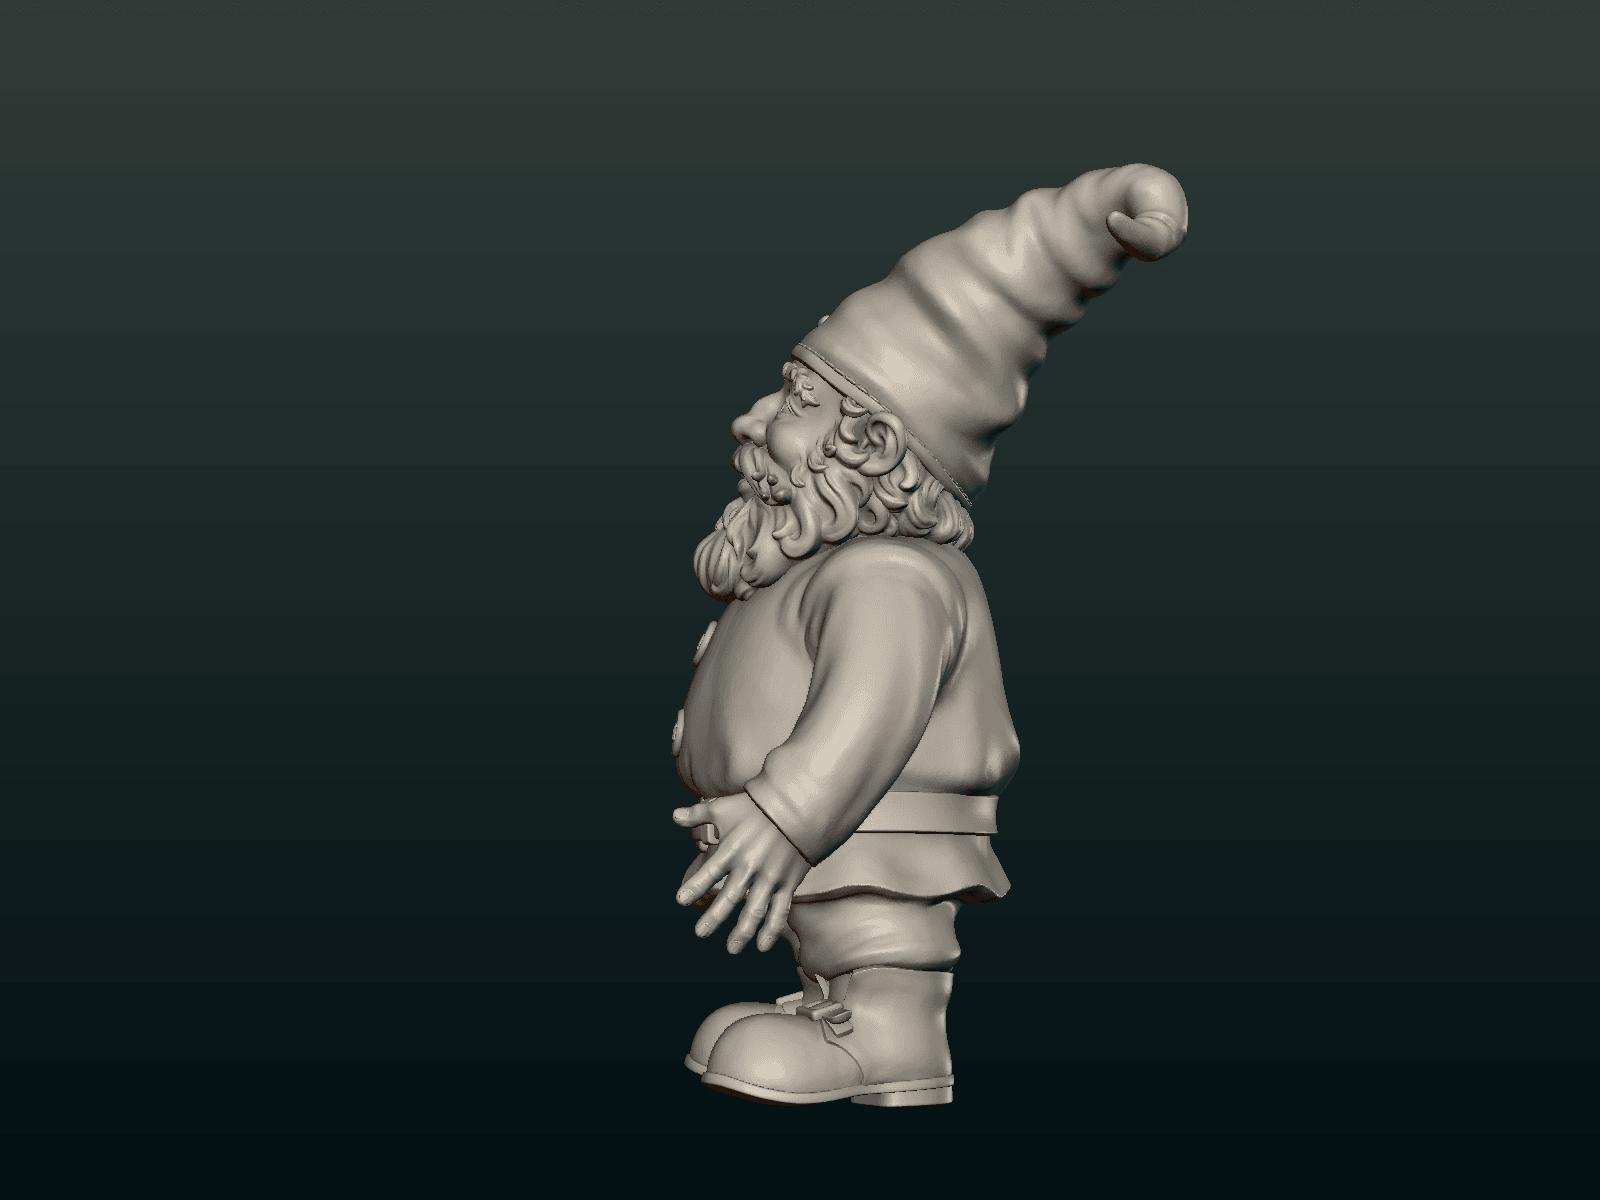 Garden_Gnome-06.png Download STL file Garden Gnome • 3D printing design, Skazok